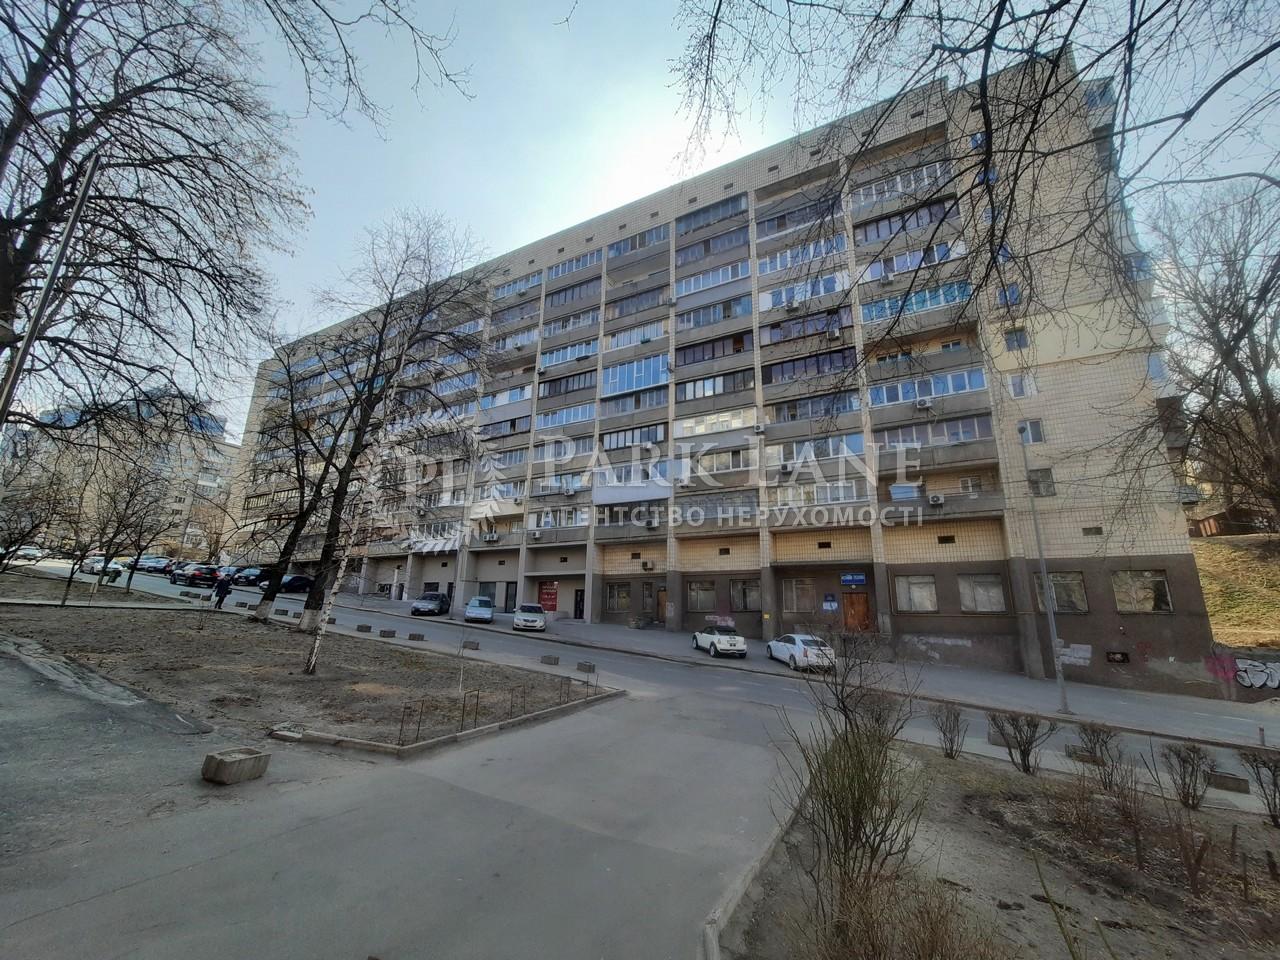 Квартира Кловский спуск, 20, Киев, R-38051 - Фото 4